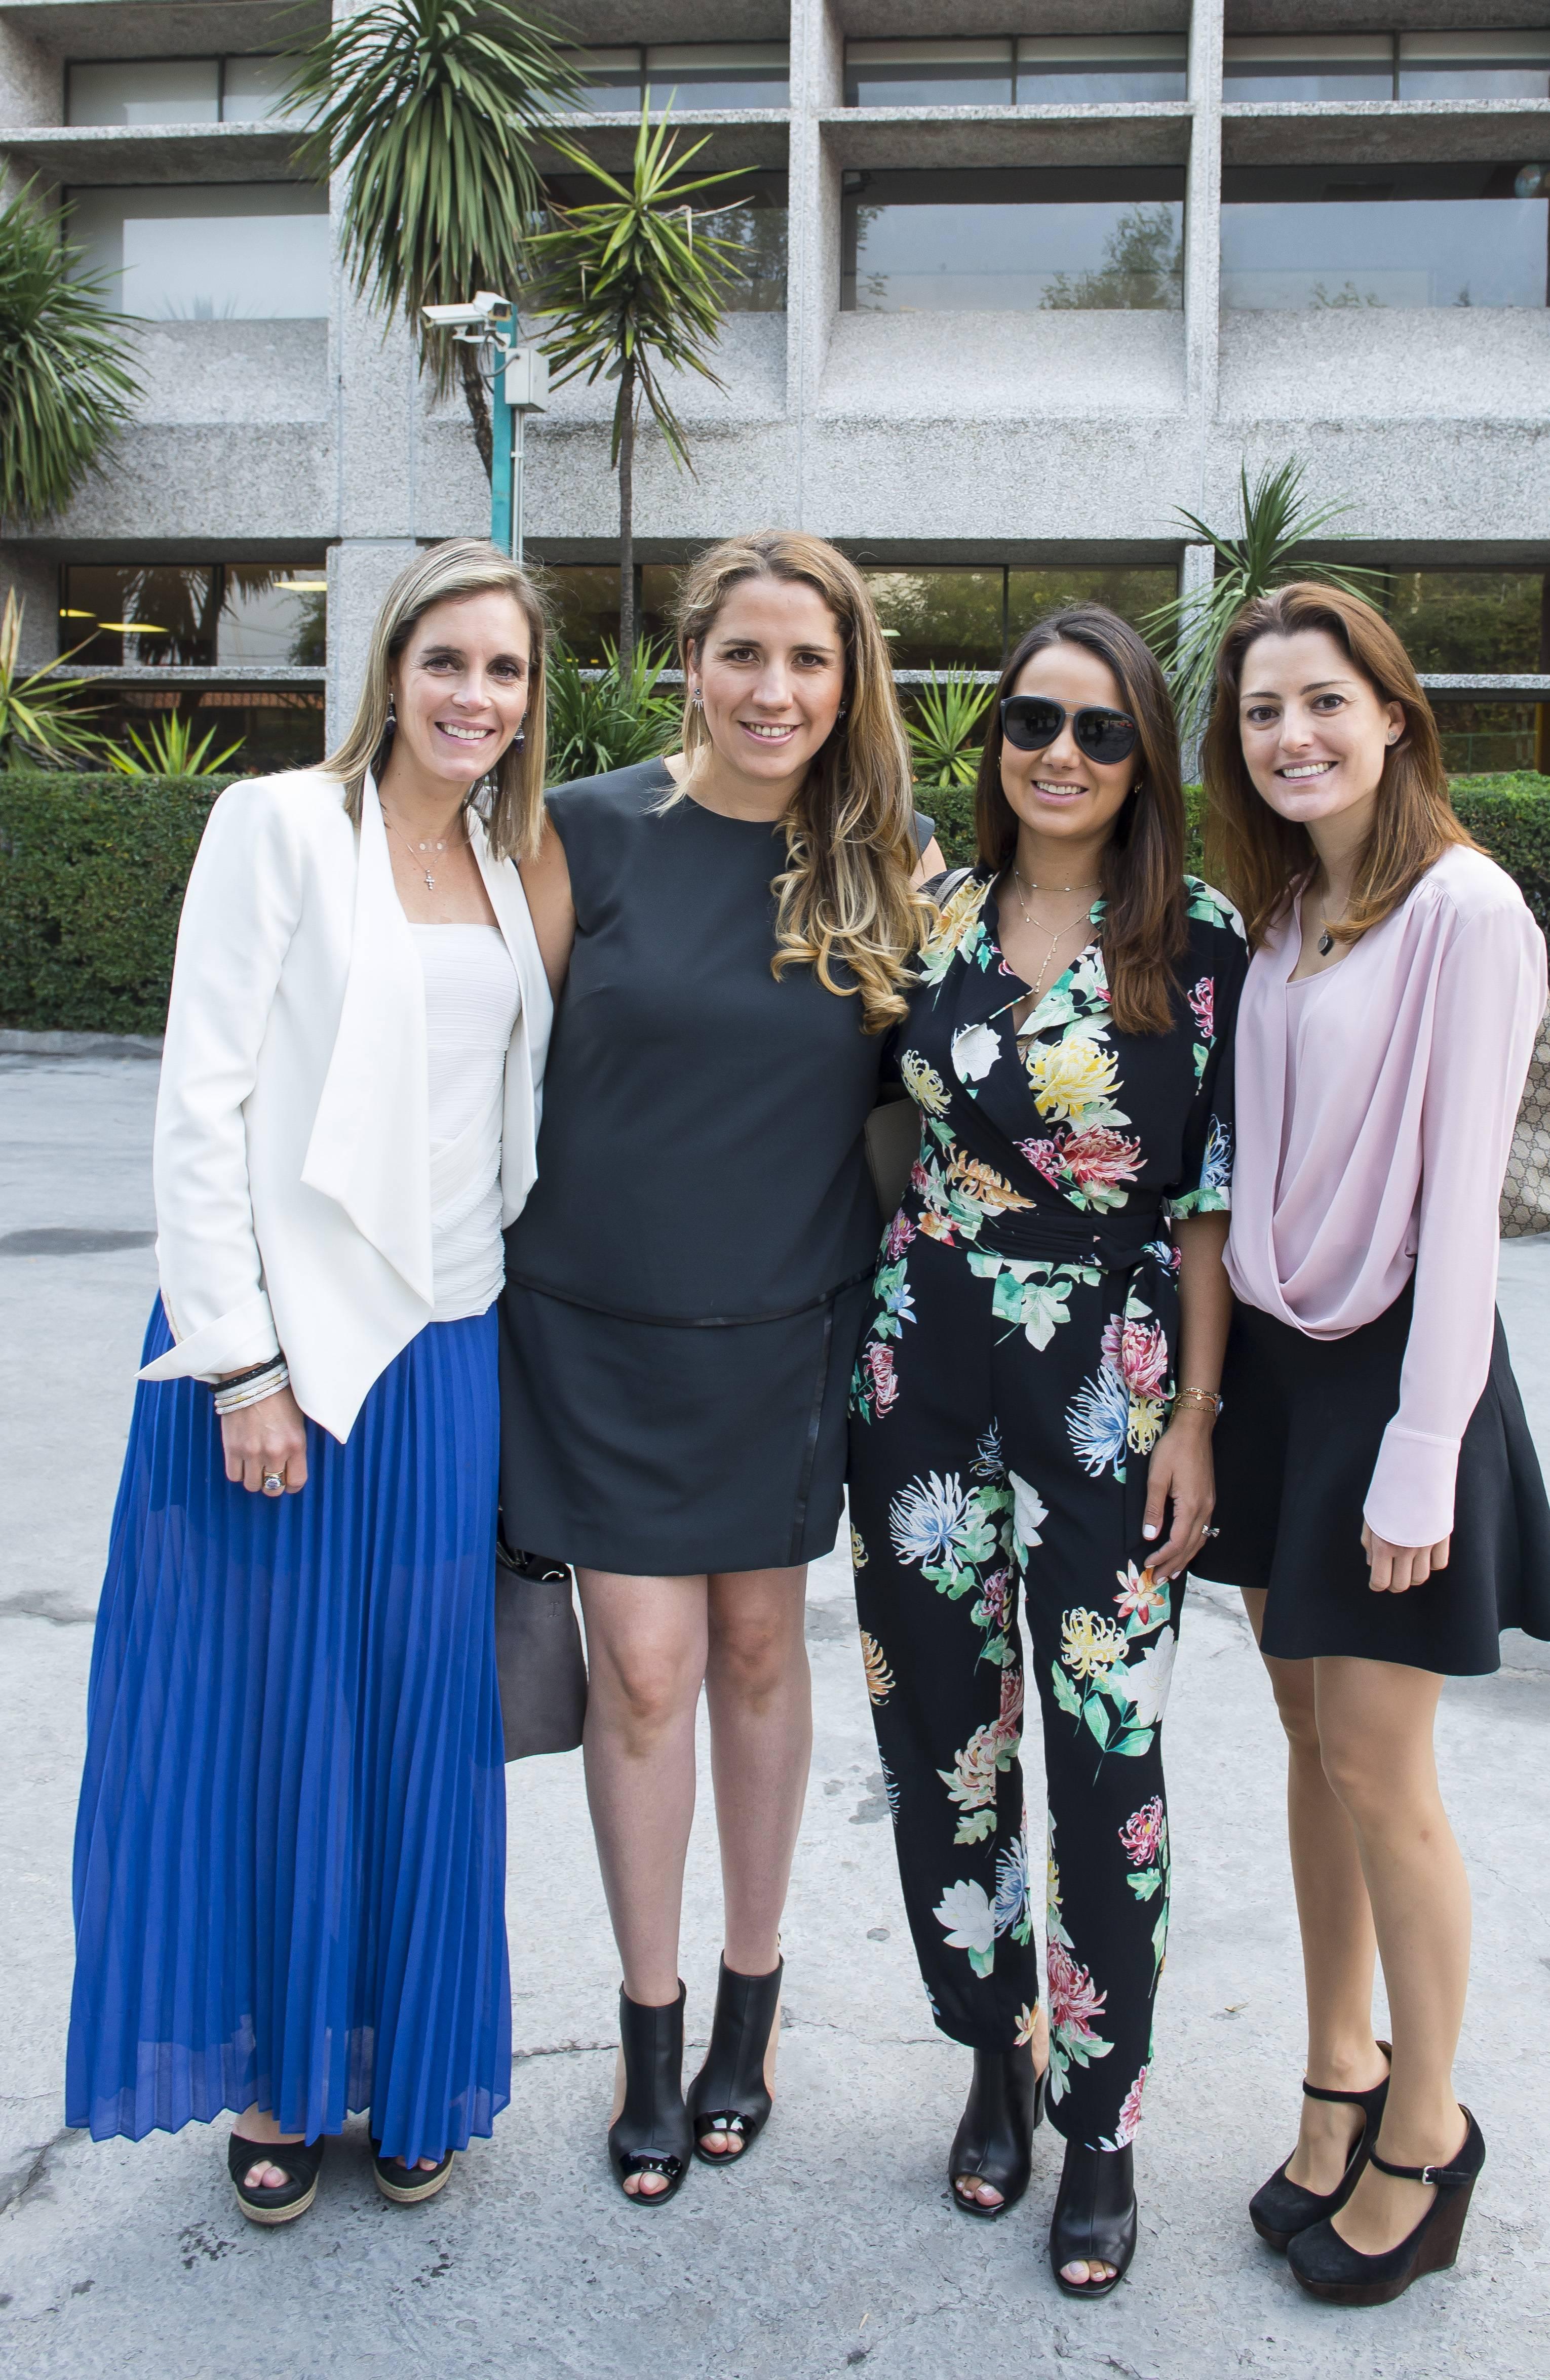 Ana Lidia Salceda, Jimena Anaya, Patricia Romo y Covadonga Rozados JDS